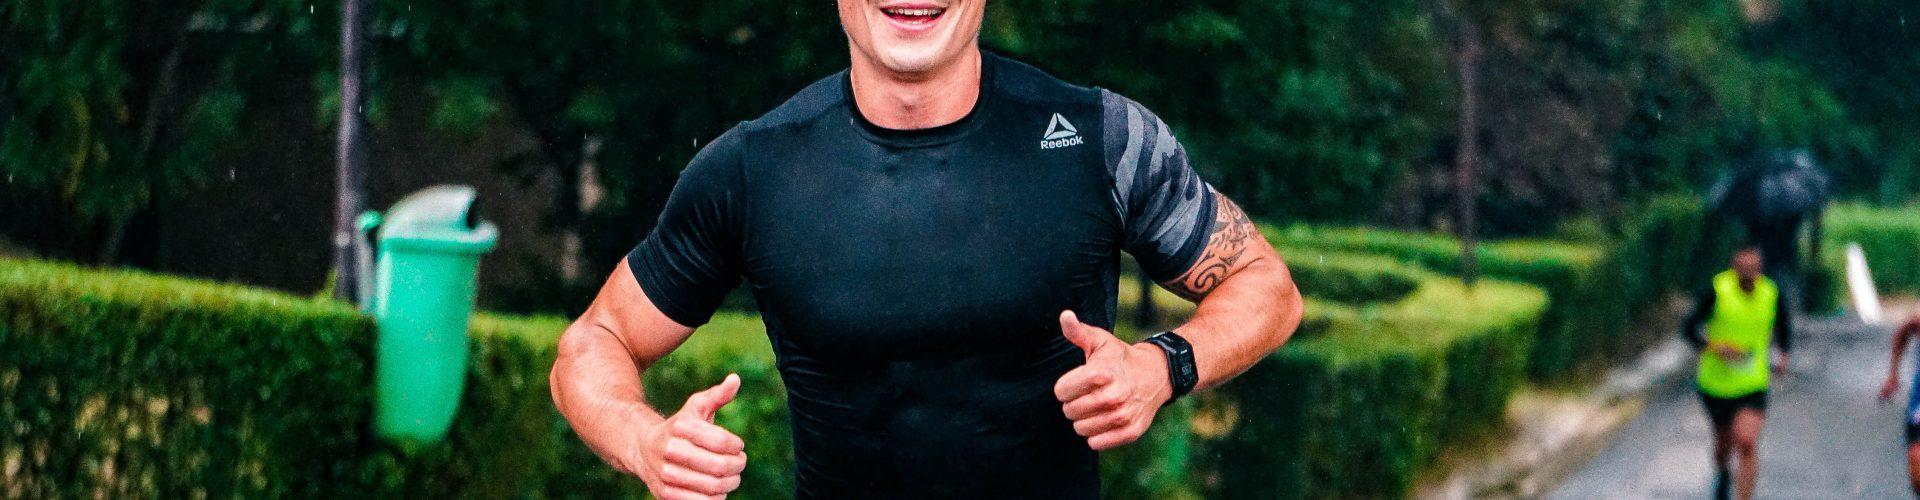 Healthy man, finishing a race